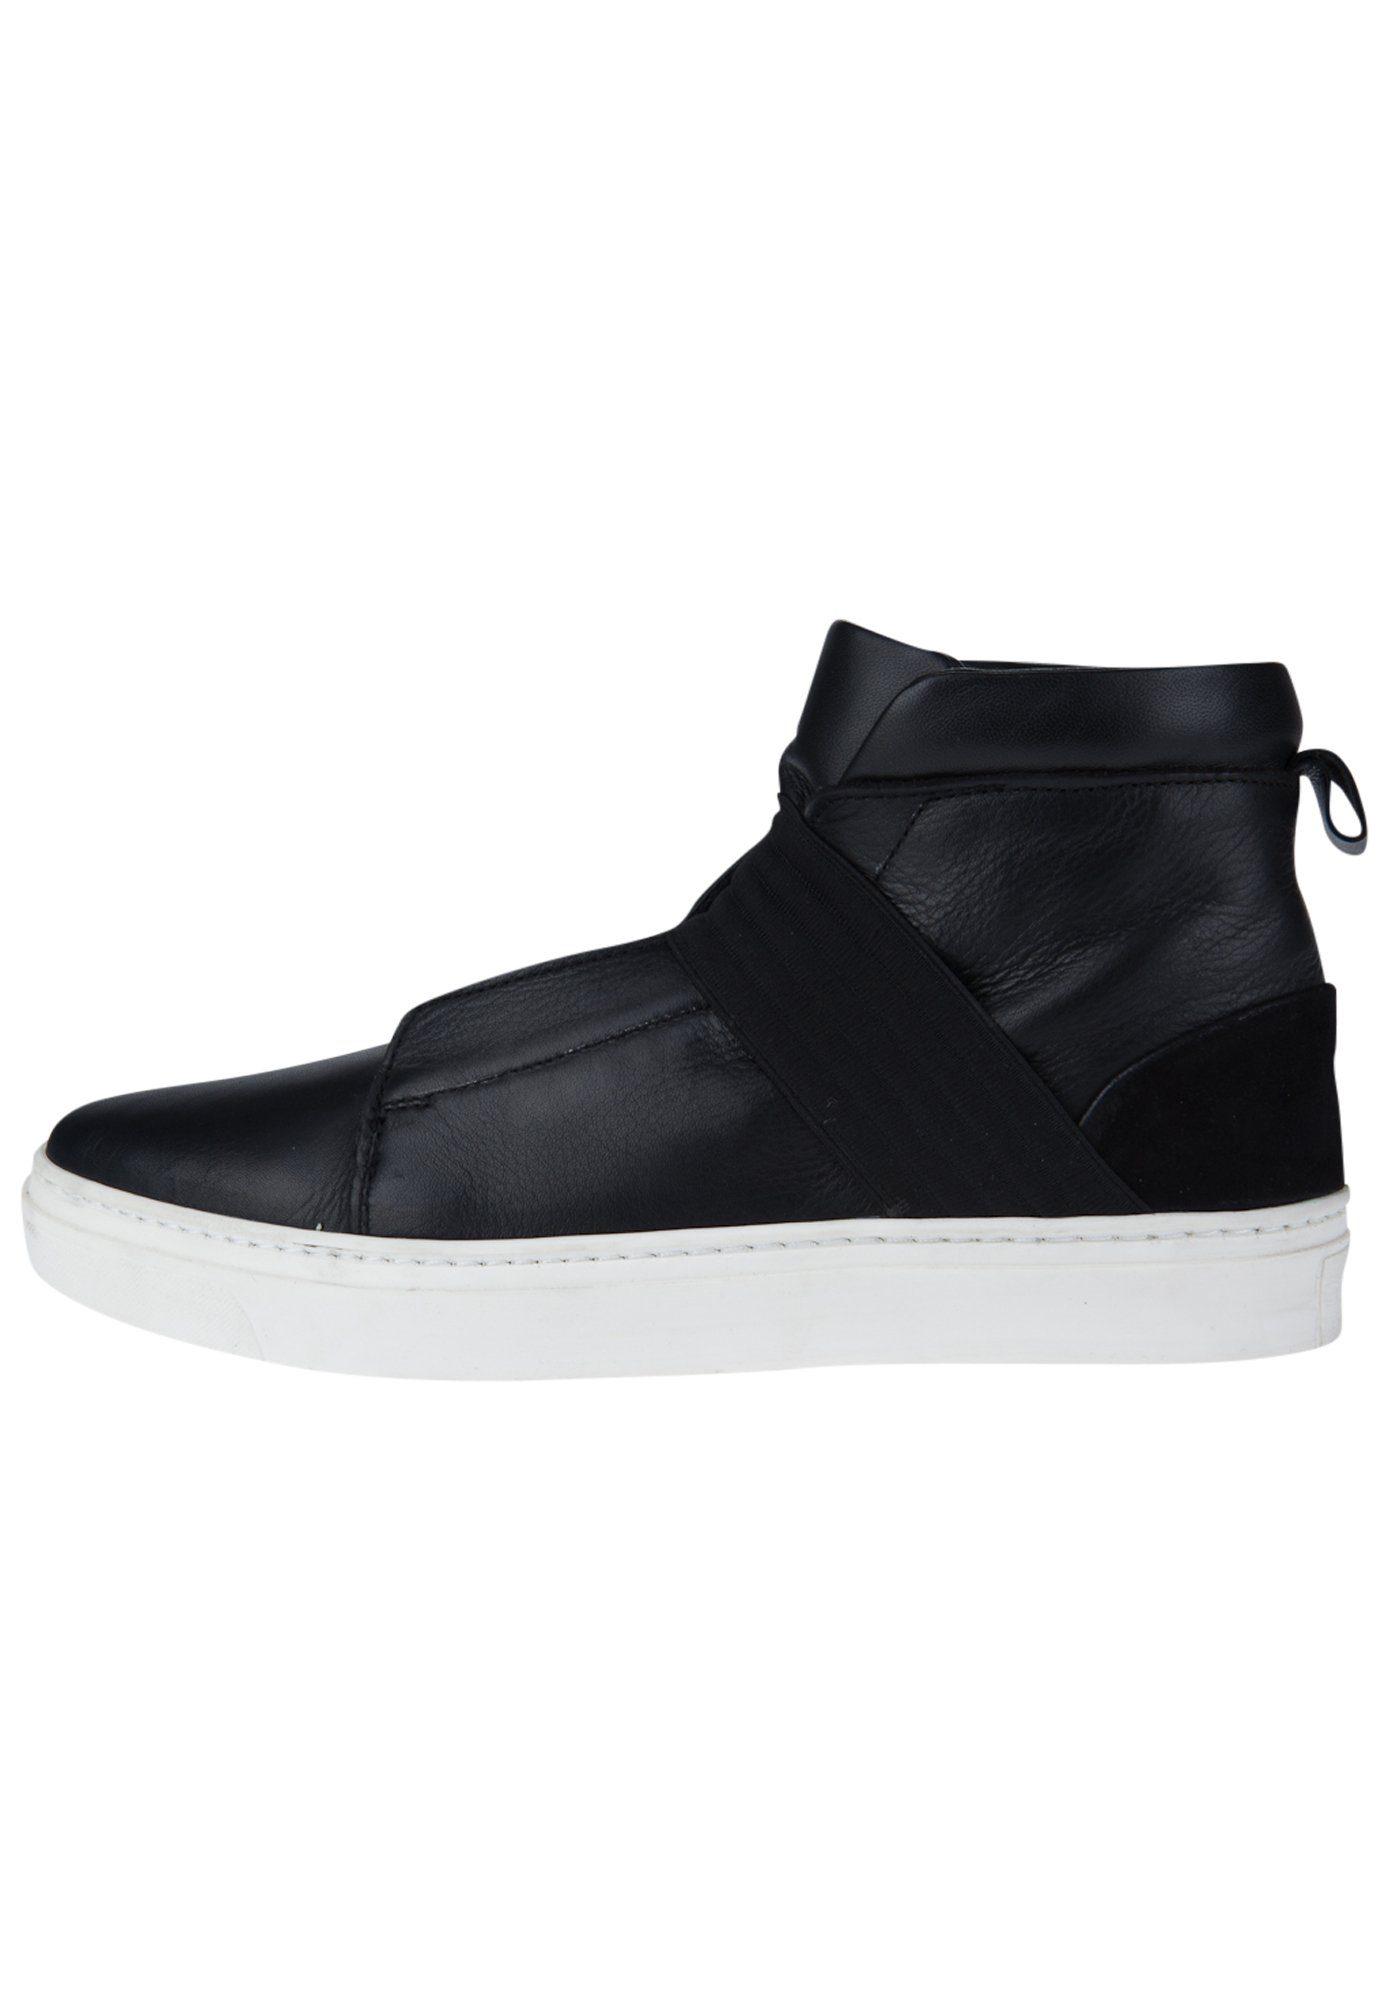 Maruti CHARLIE LEATHER Sneaker online kaufen  black